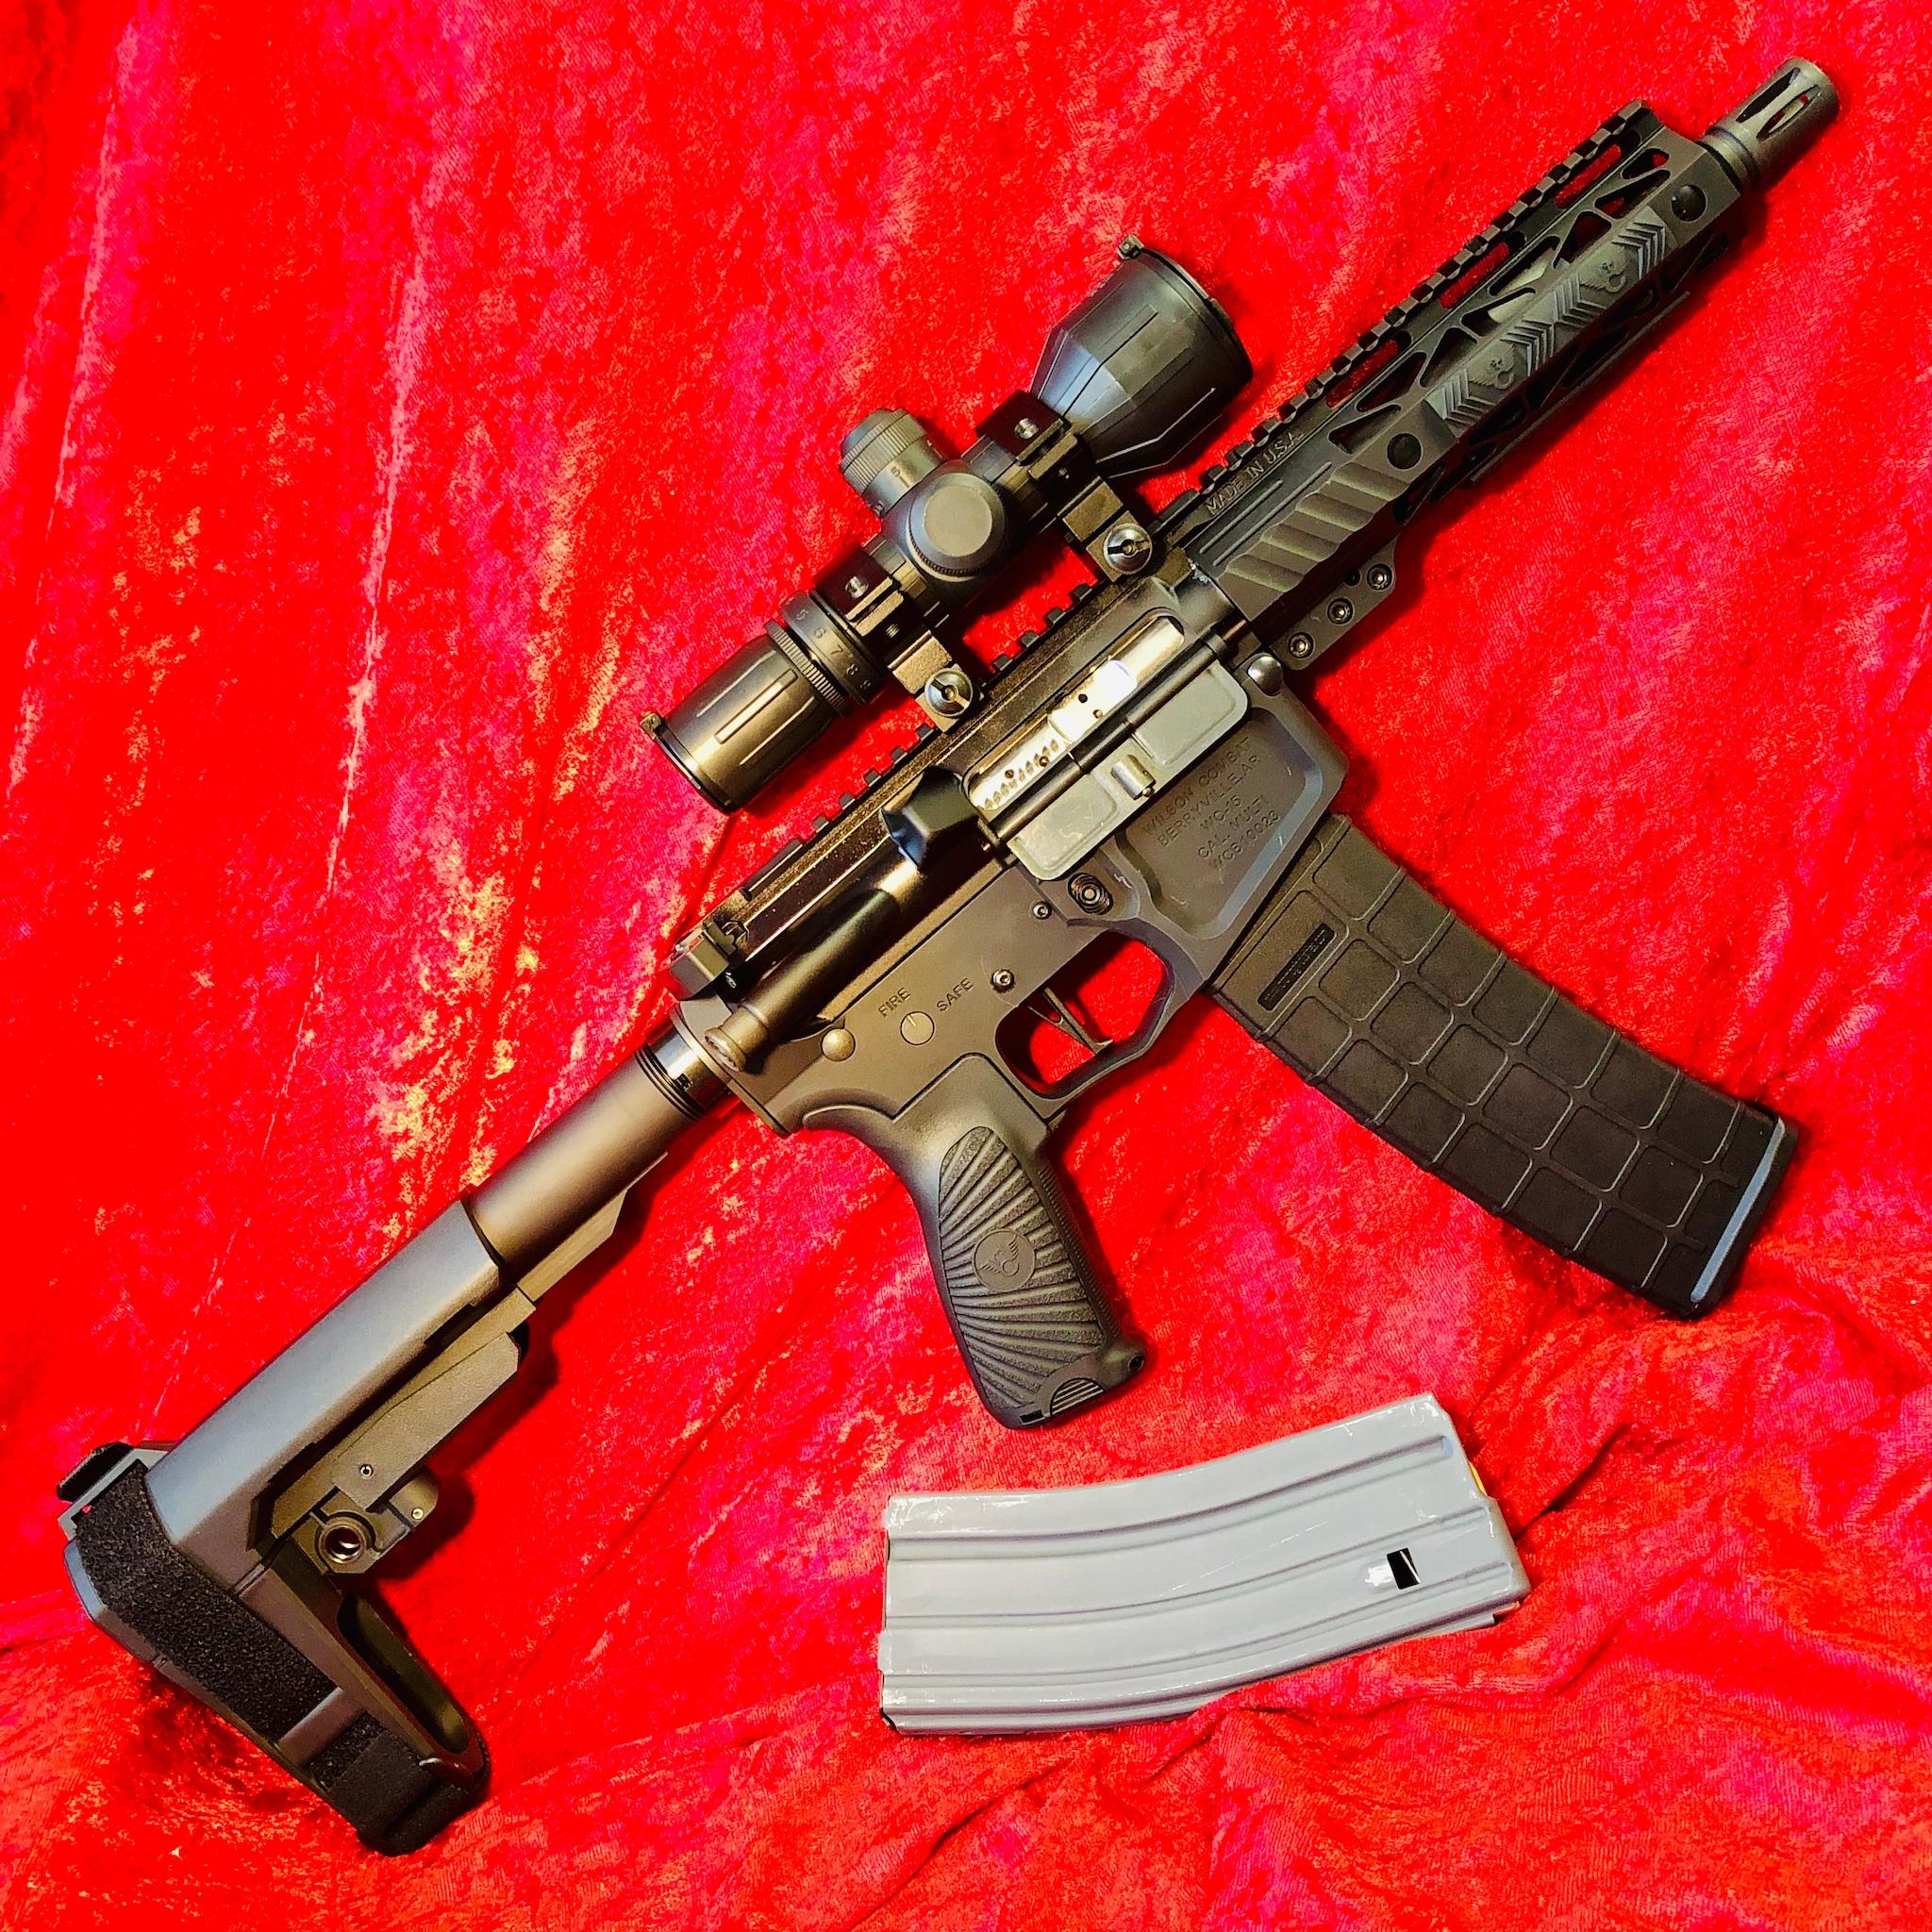 Wilson Combat Wc-15 Ar-15 Mil-spec Custom Pdw Pistol 300 Blackout - For Sale :: Guns.com